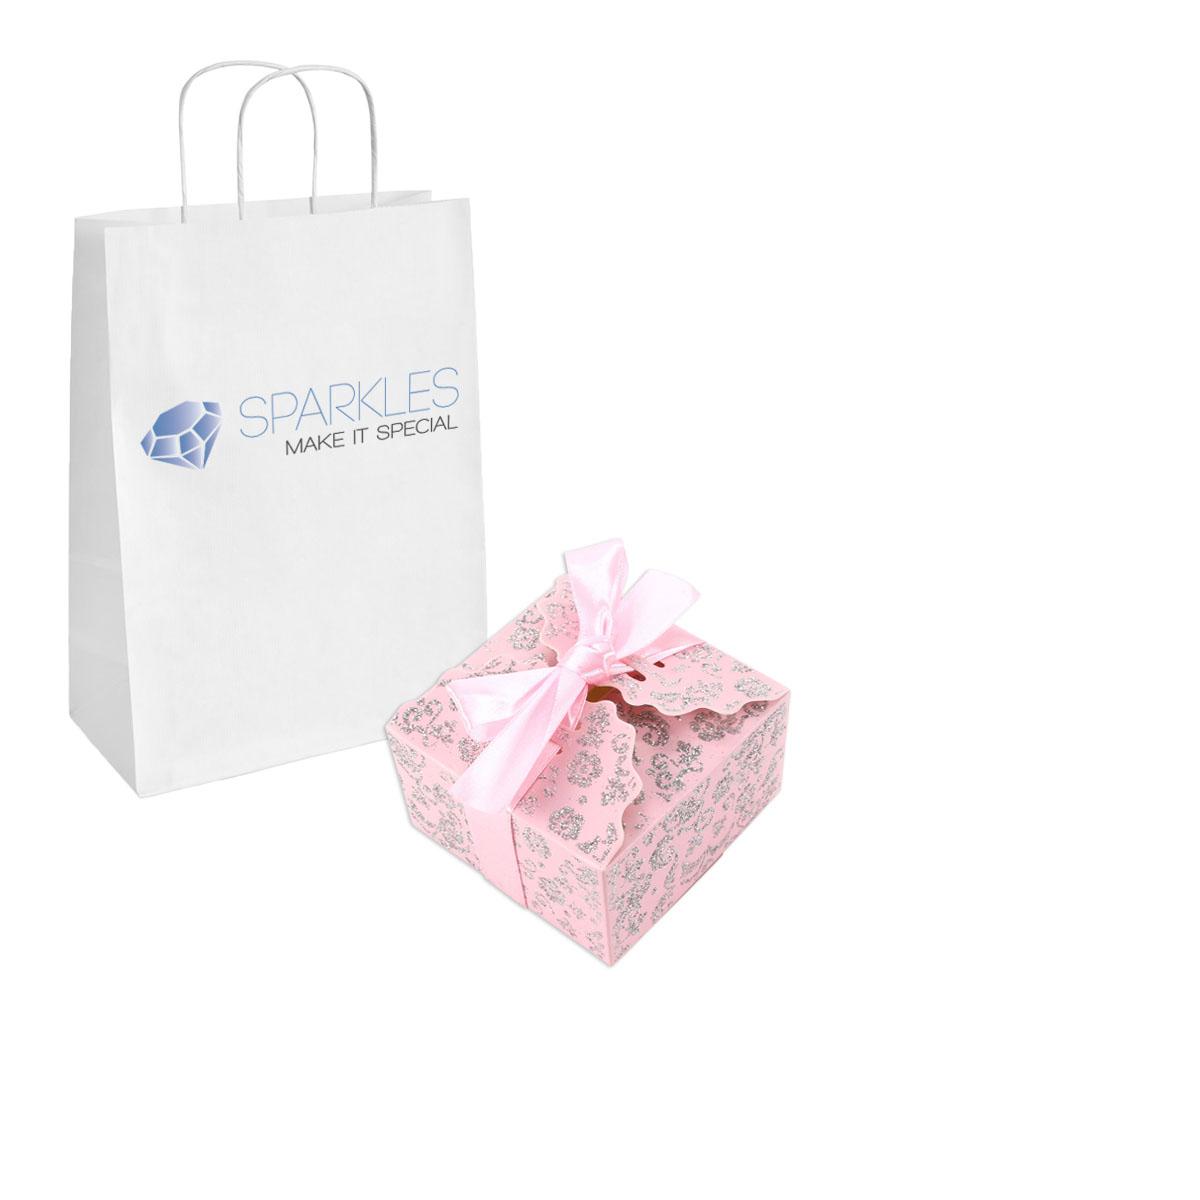 Home & Garden > Wedding Supplies > Wedding Favors